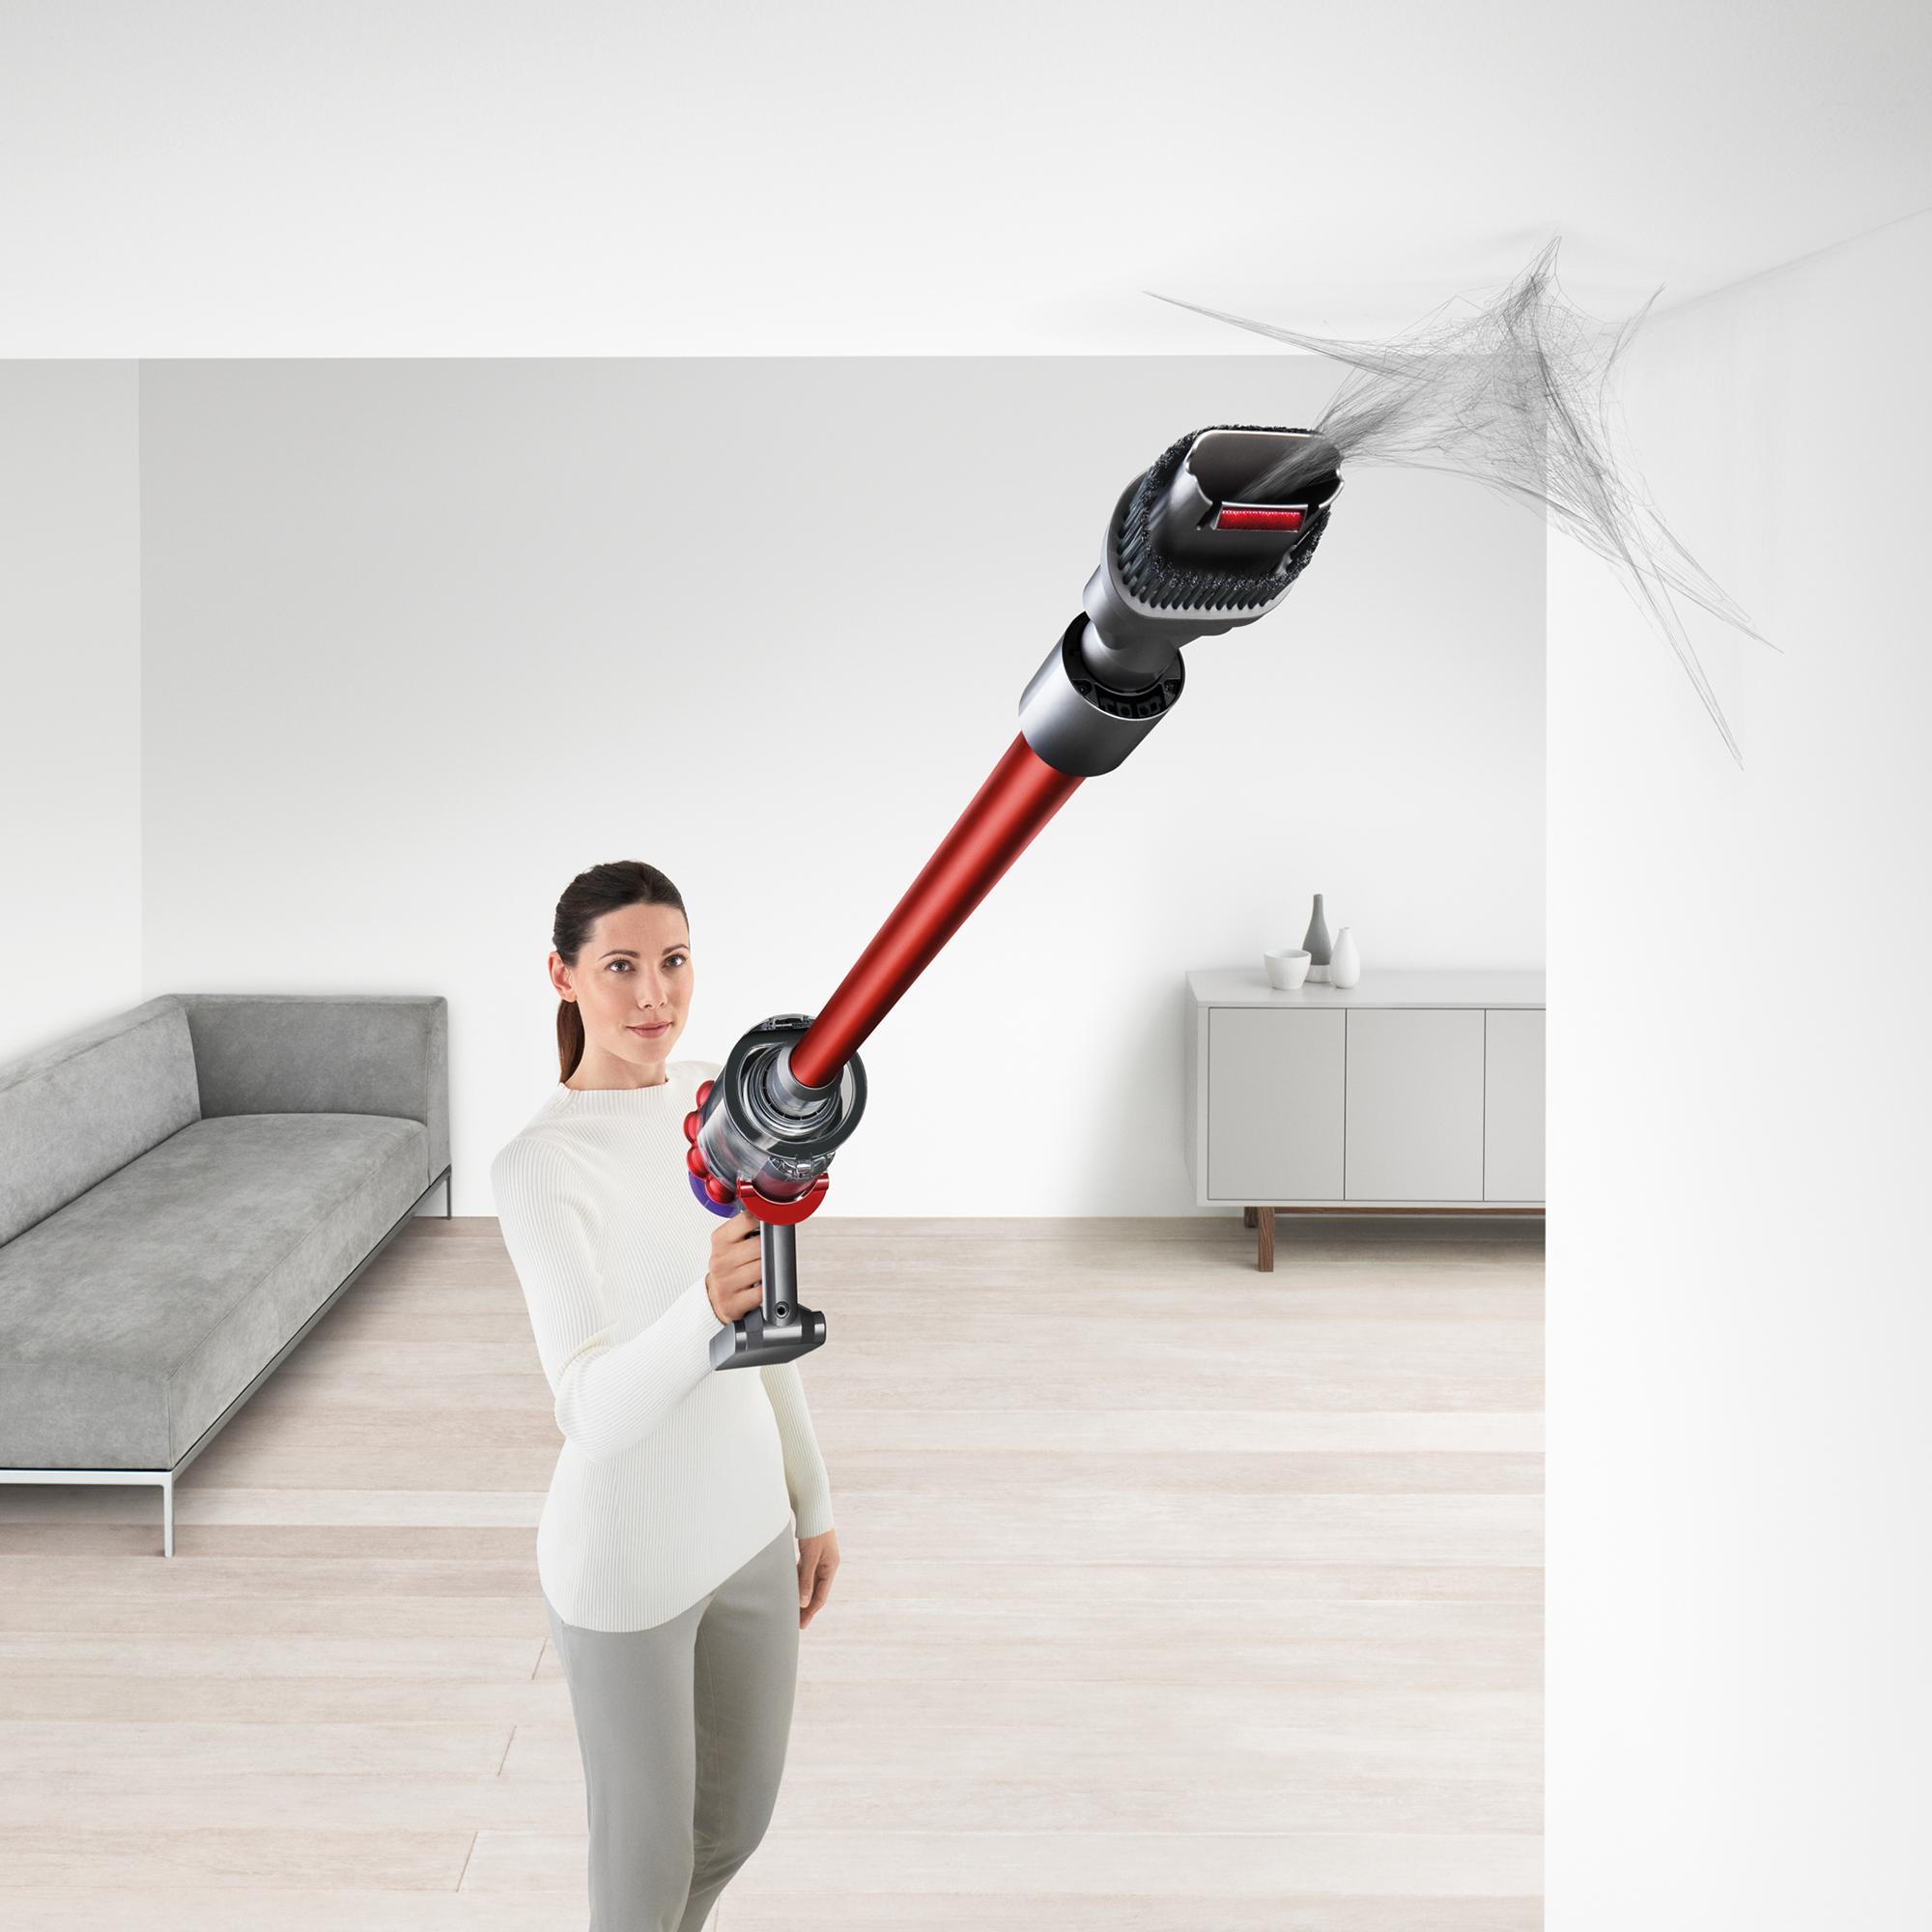 Dyson-V10-Animal-Pro-Cordless-Vacuum-Cleaner-Refurbished thumbnail 28